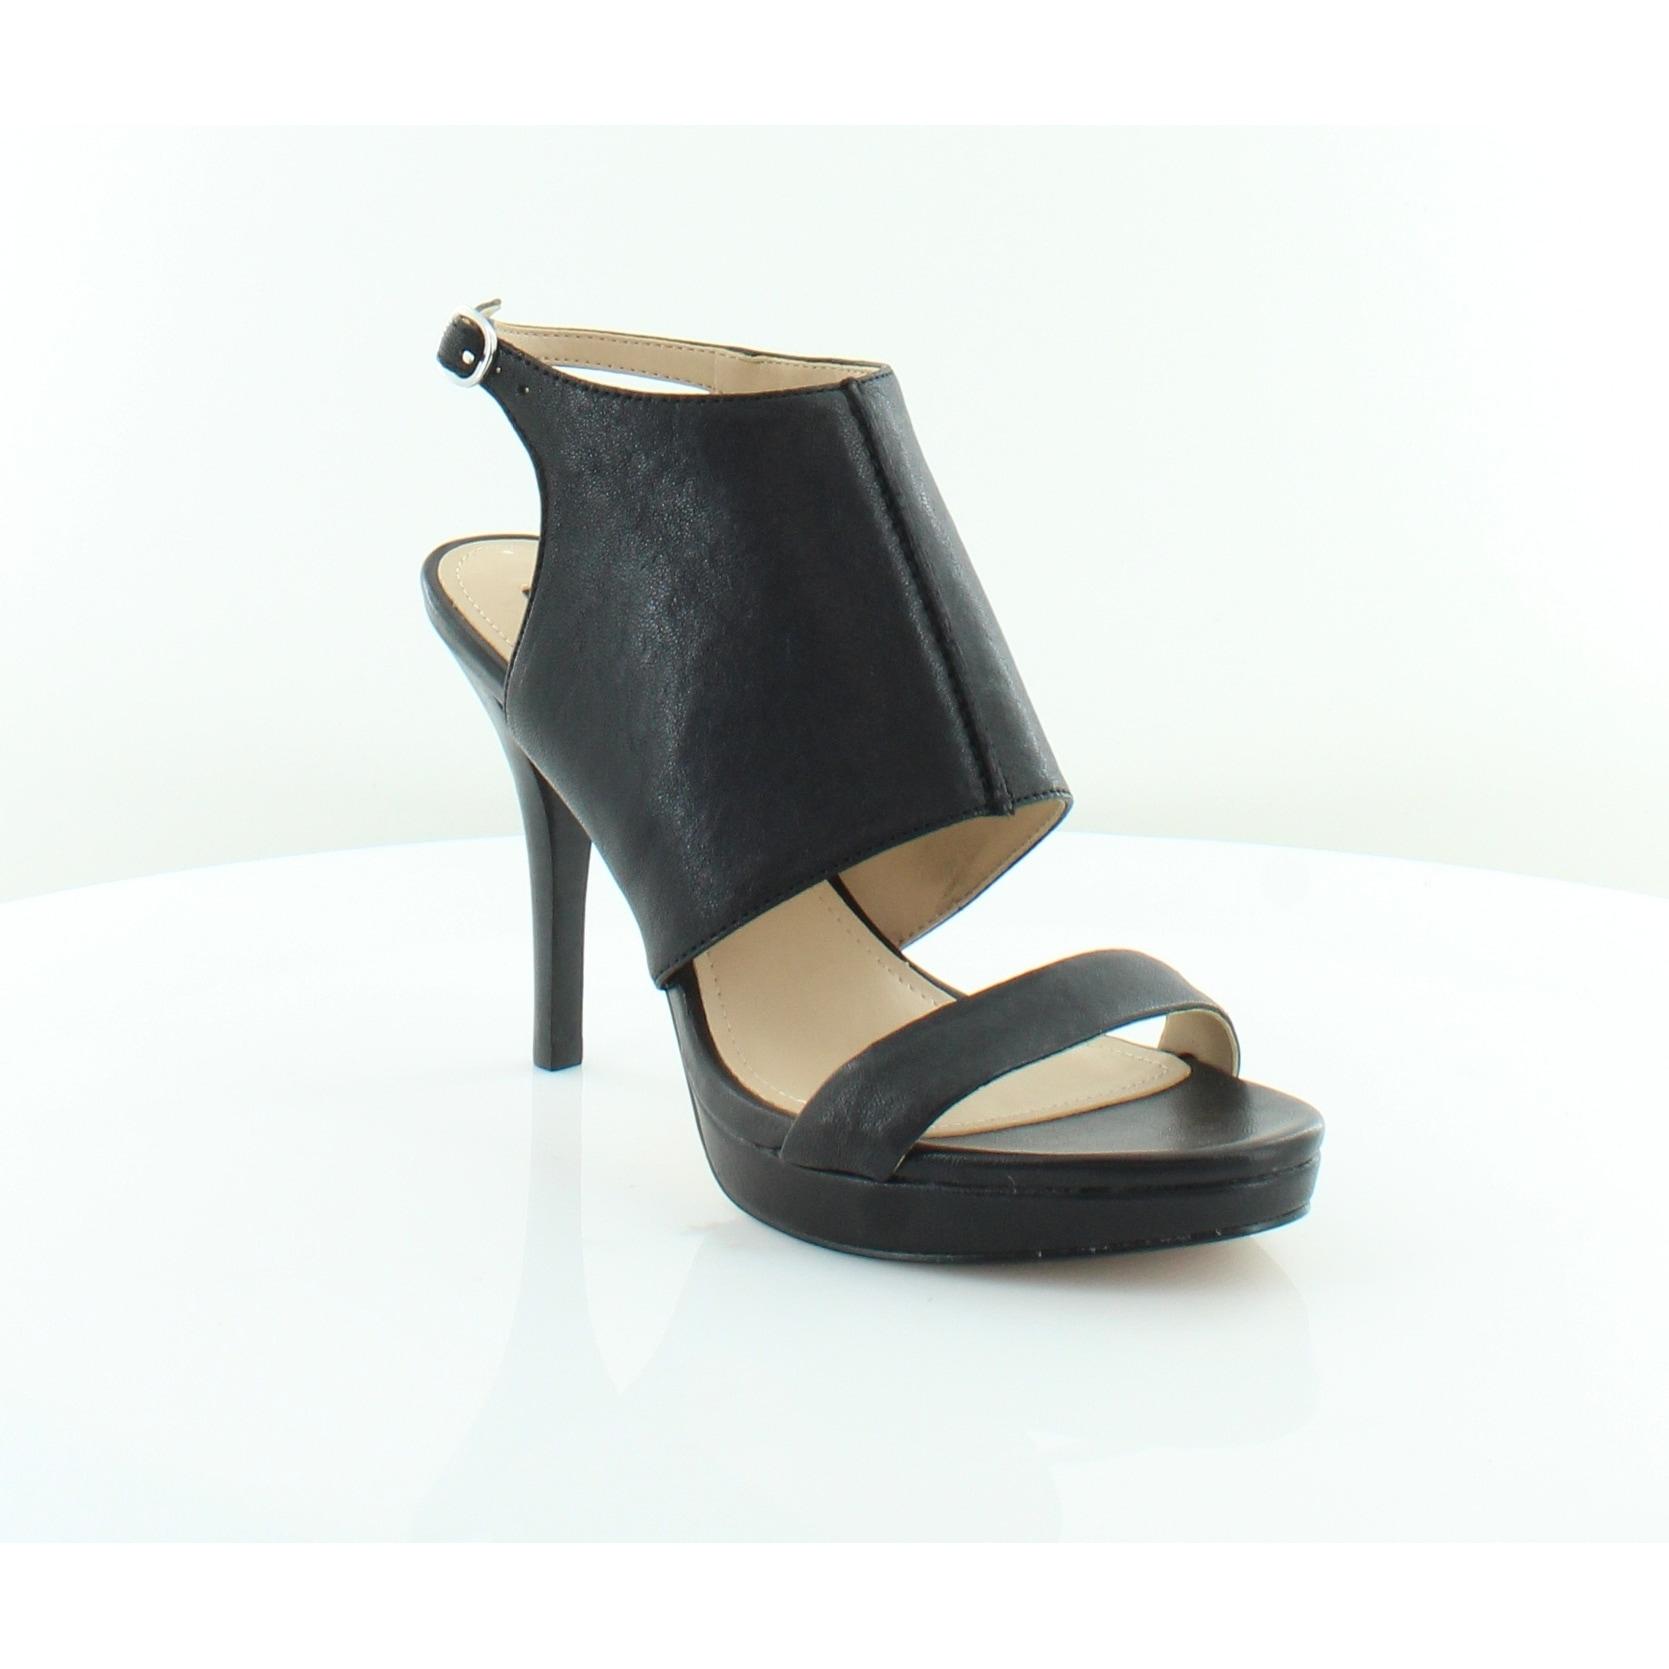 50ca9b7e4925 Shop DKNY Bren Women s Heels Black - Free Shipping Today - Overstock ...